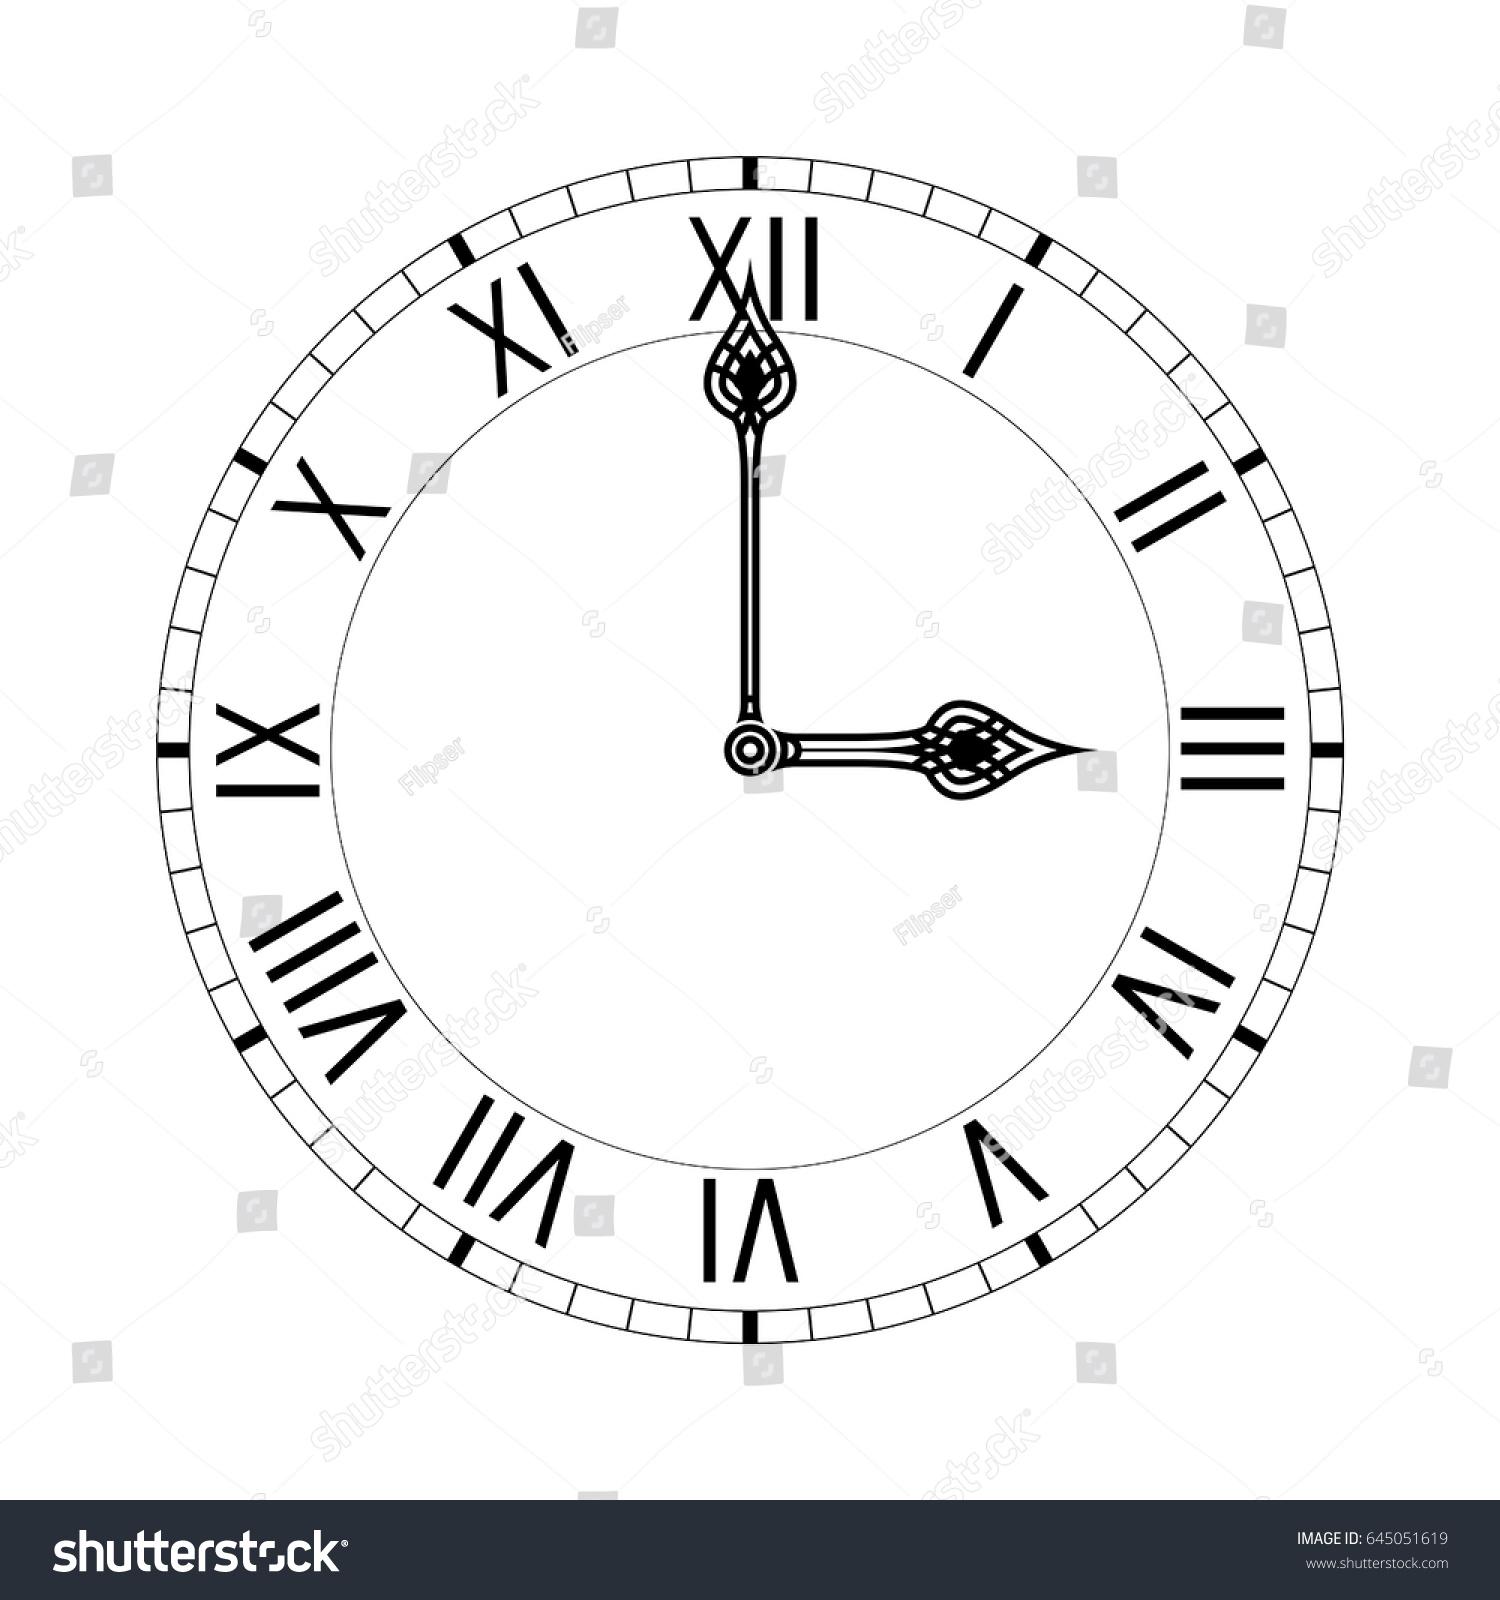 Simple Clock Face Roman Numerals Vector Stock Vector Royalty Free - 3-roman-numerals-clocks